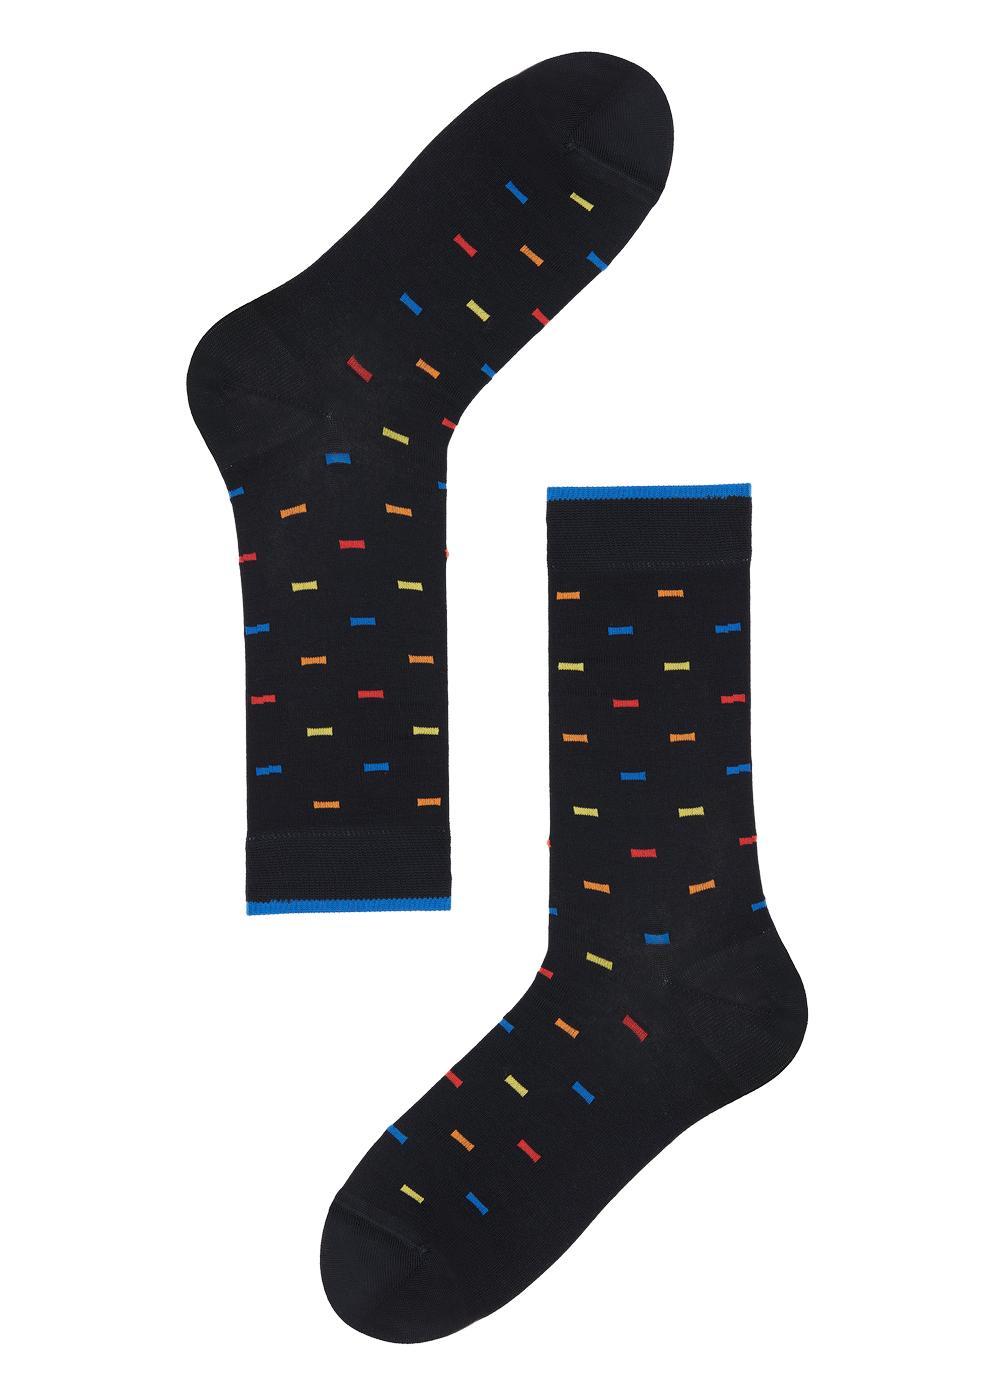 Patterned cotton ankle socks